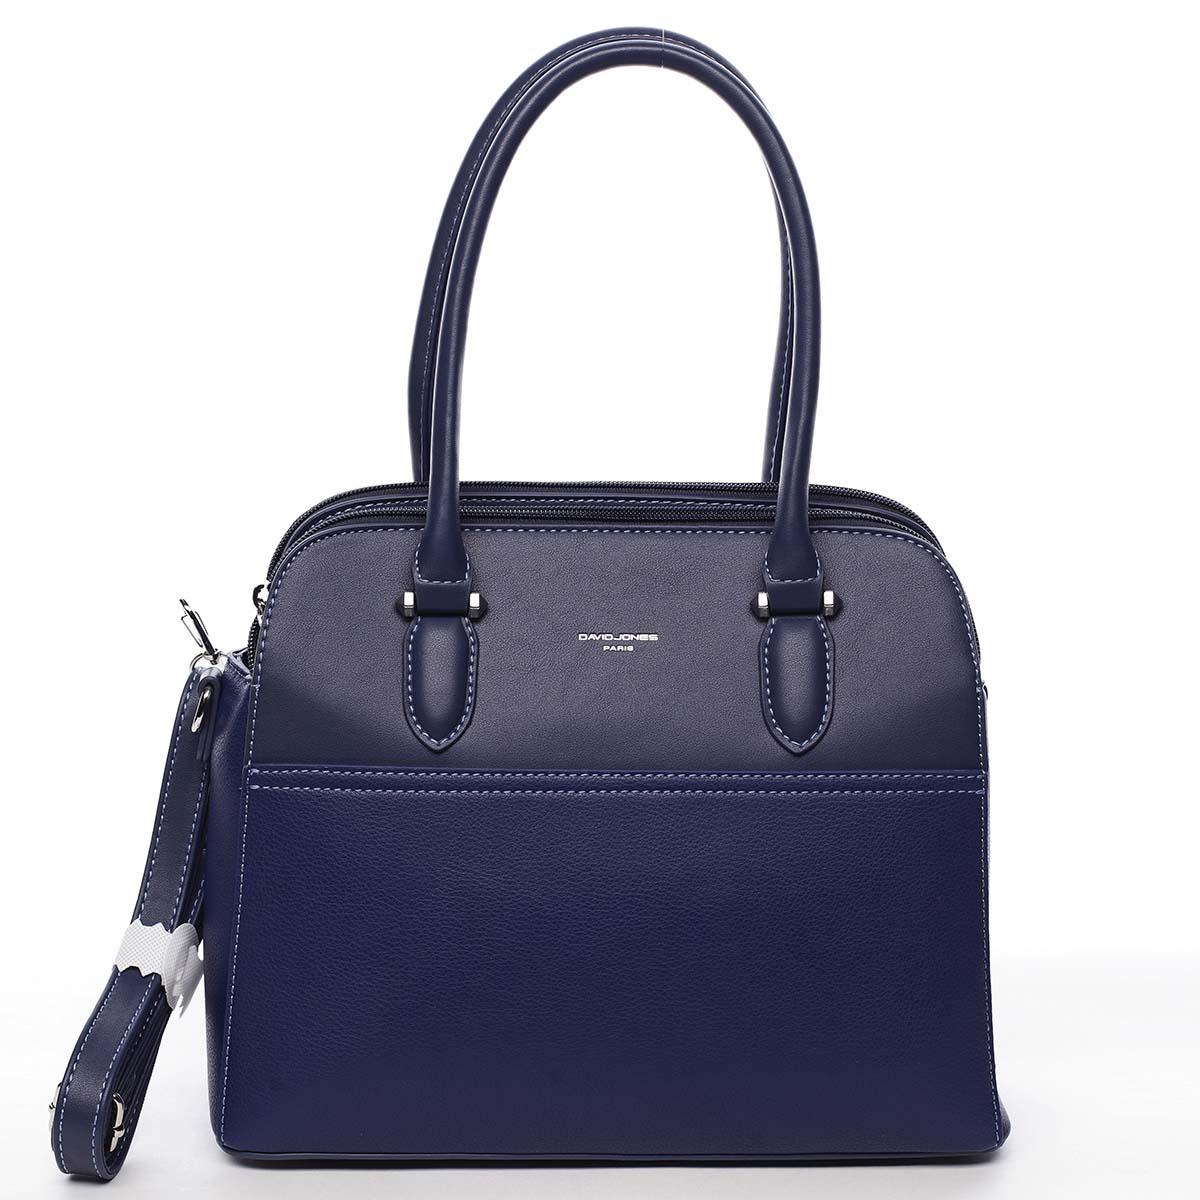 Dámska kabelka cez rameno tmavo modrá - David Jones Lalapona tmavo modra